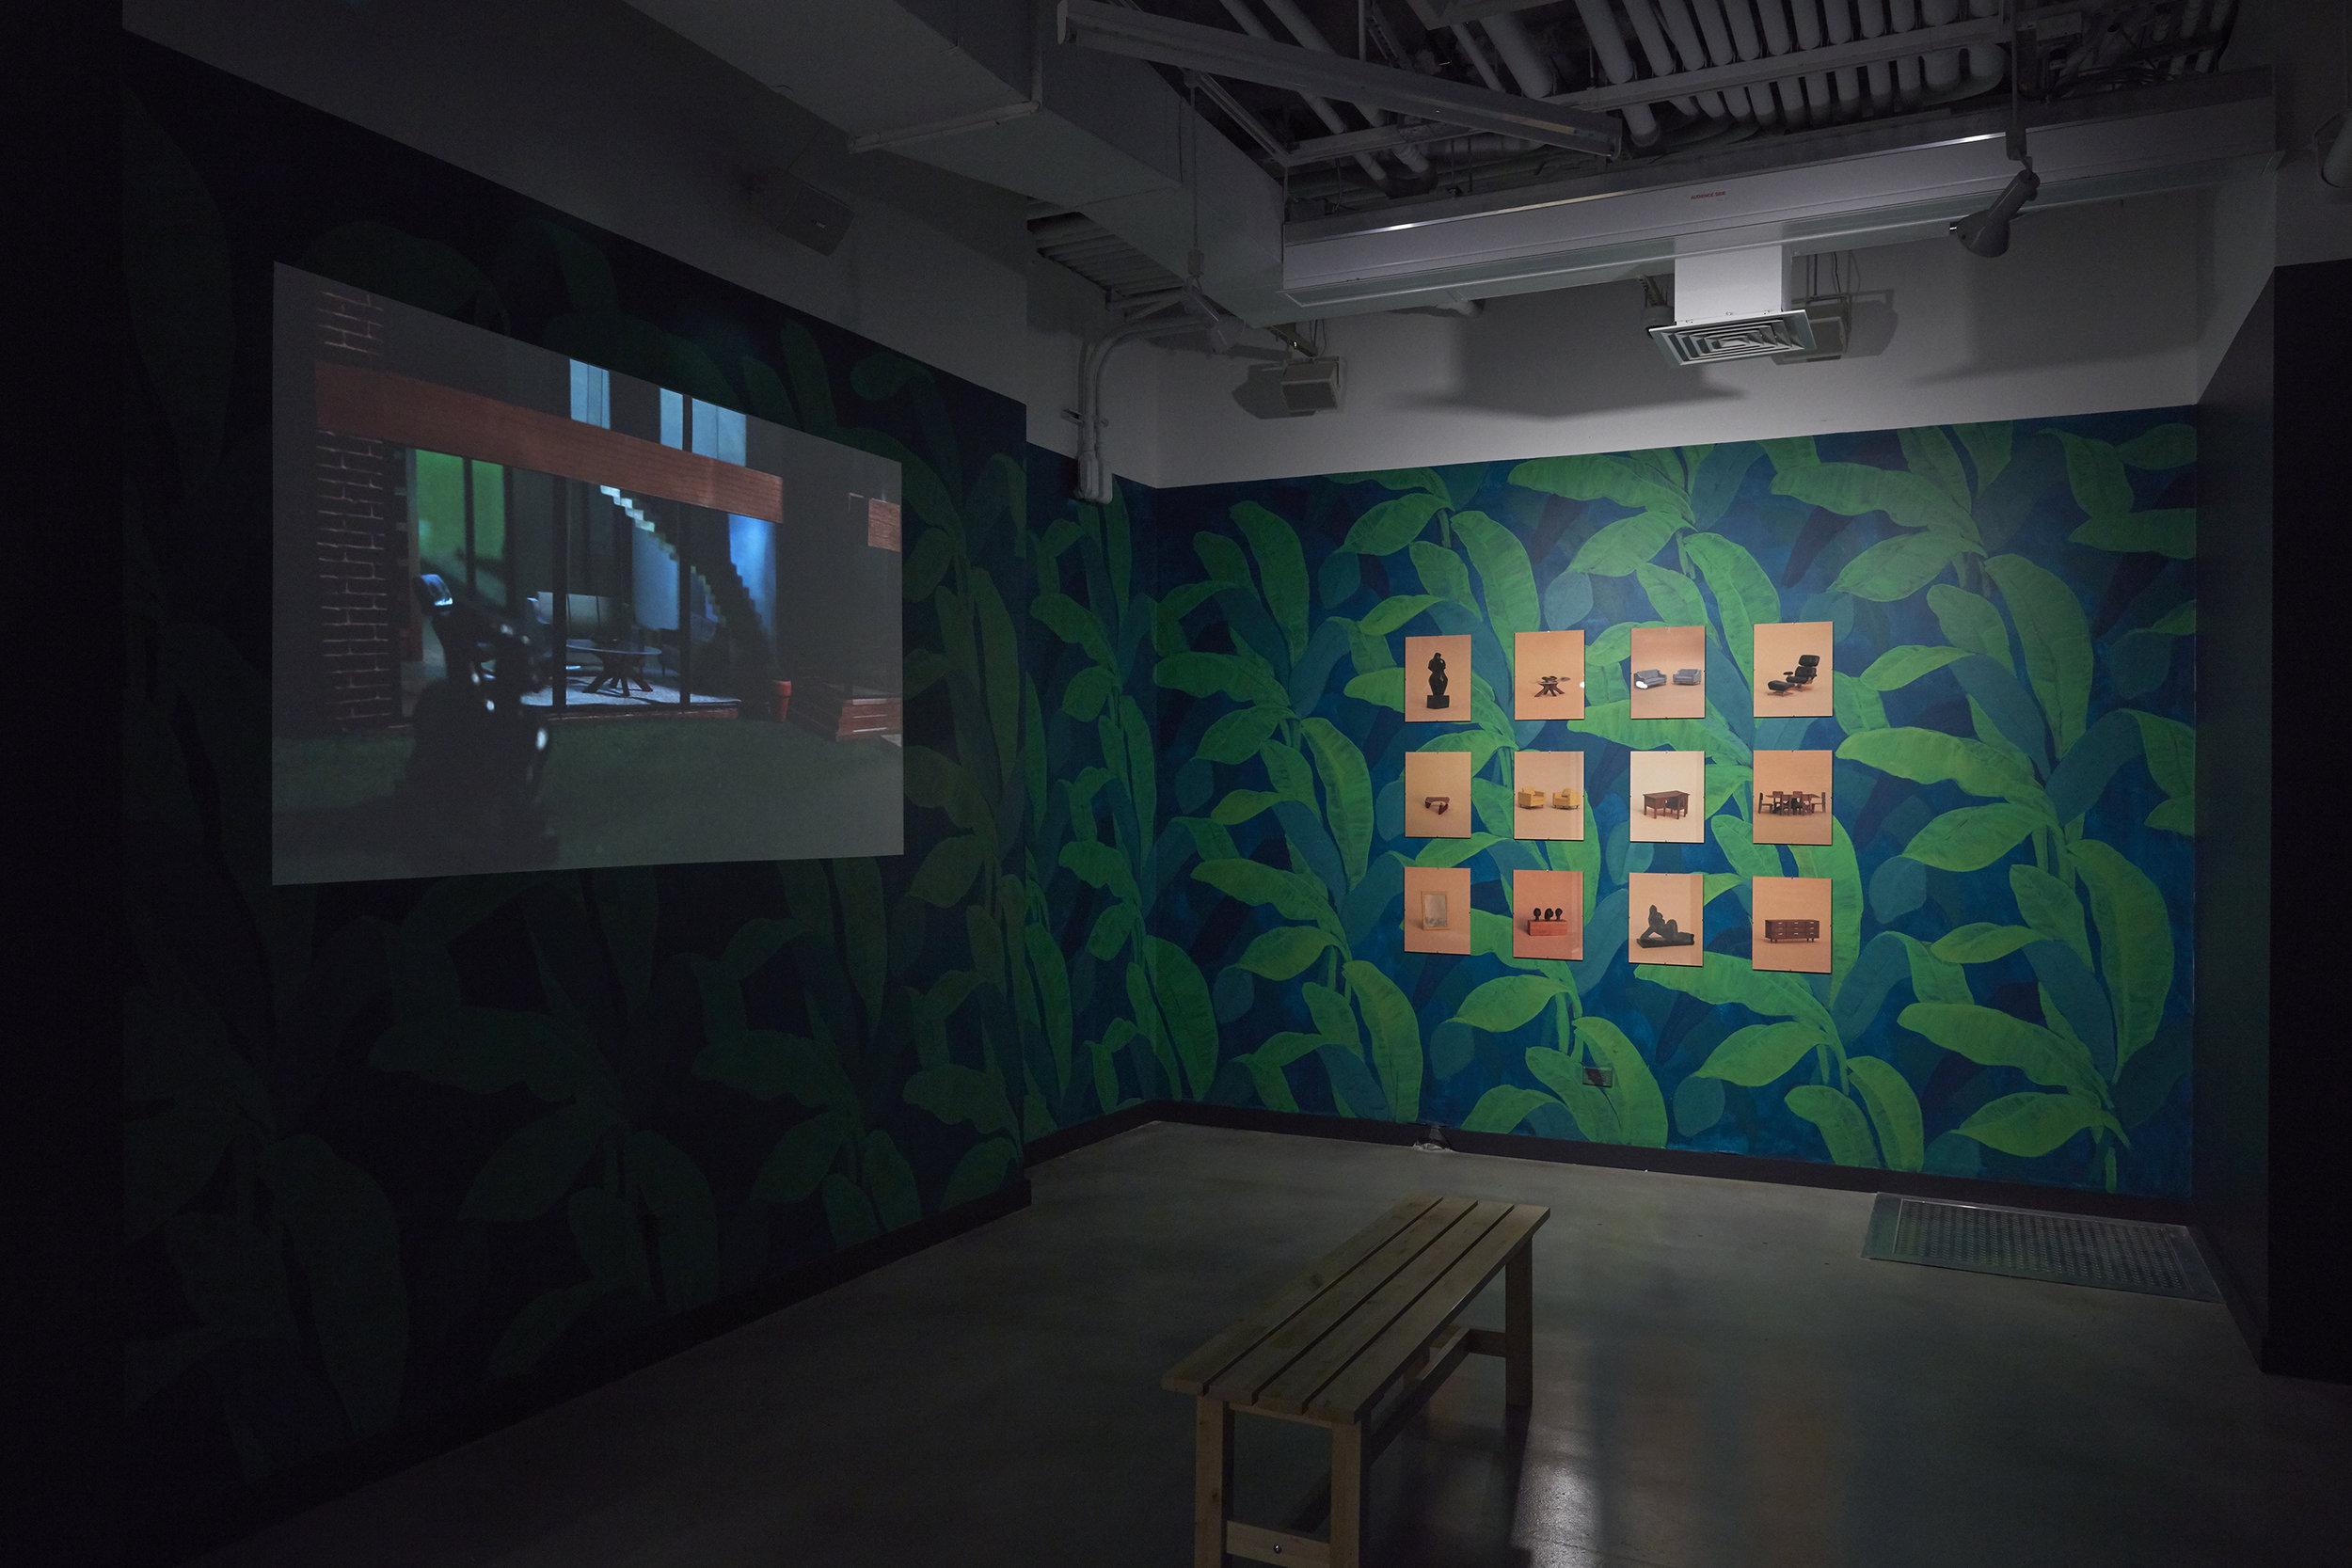 Installation Shot: Eavesdropping at BRIC Arts Media, 2016. Photo Credit: Jason Wyche